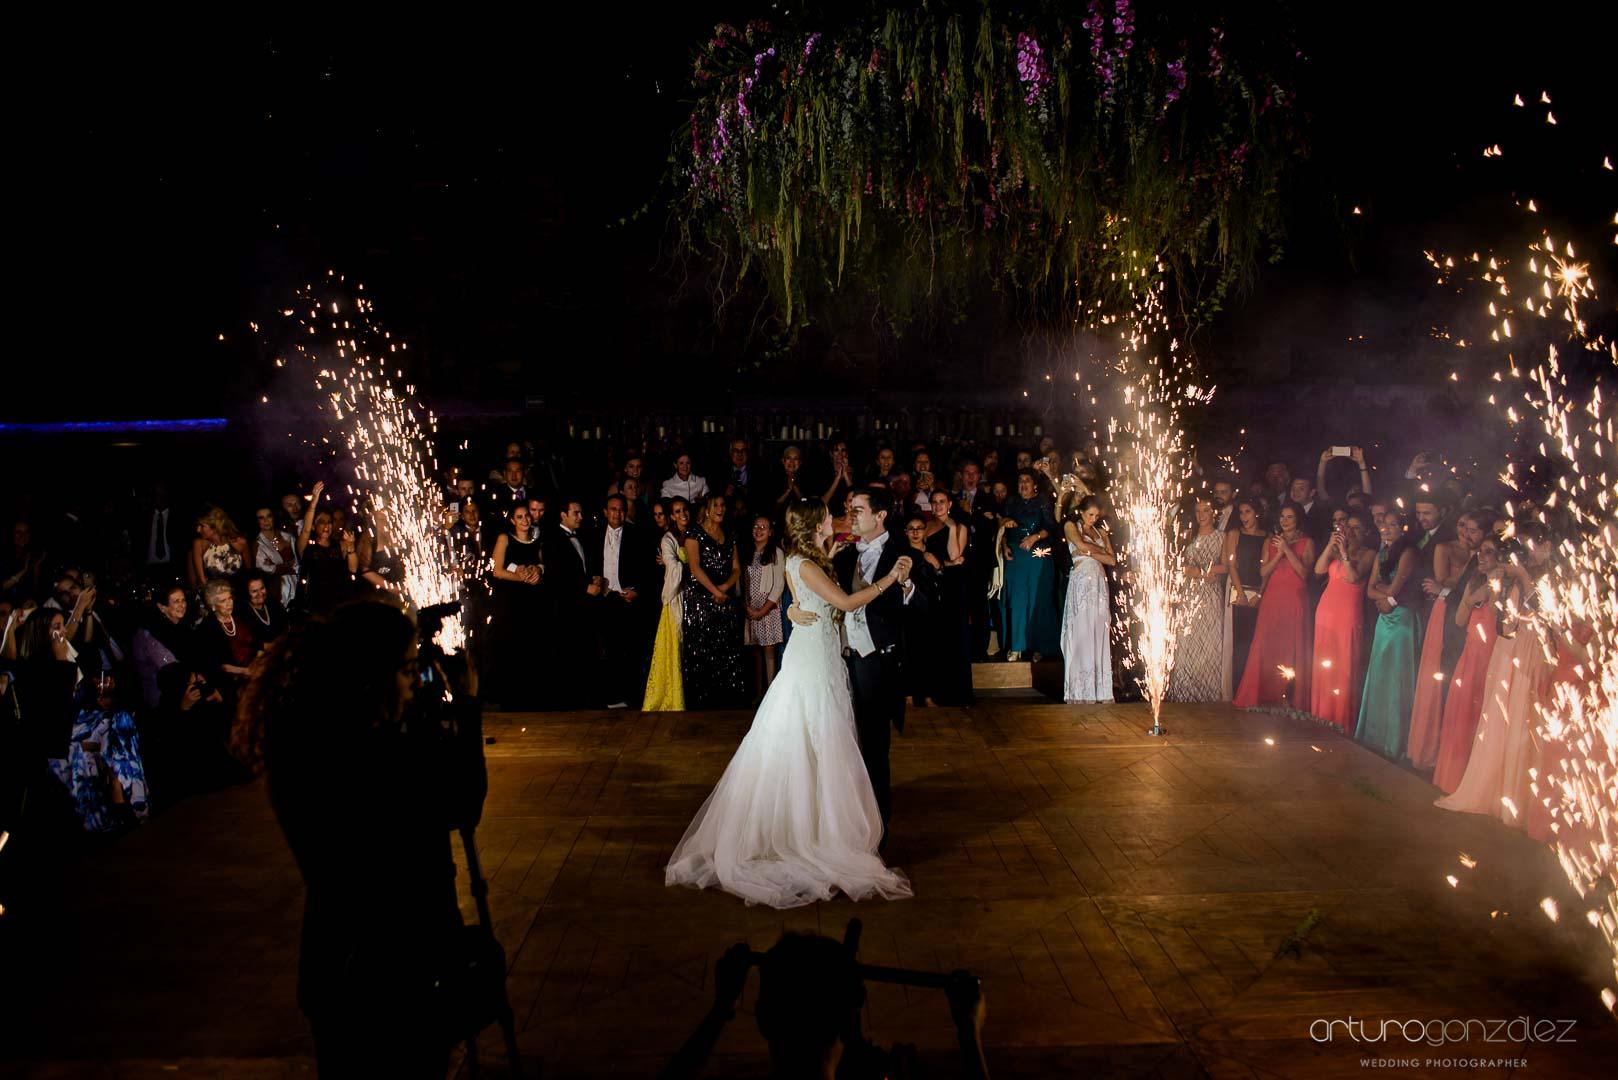 fotografo-de-bodas-en-guanajuato-111